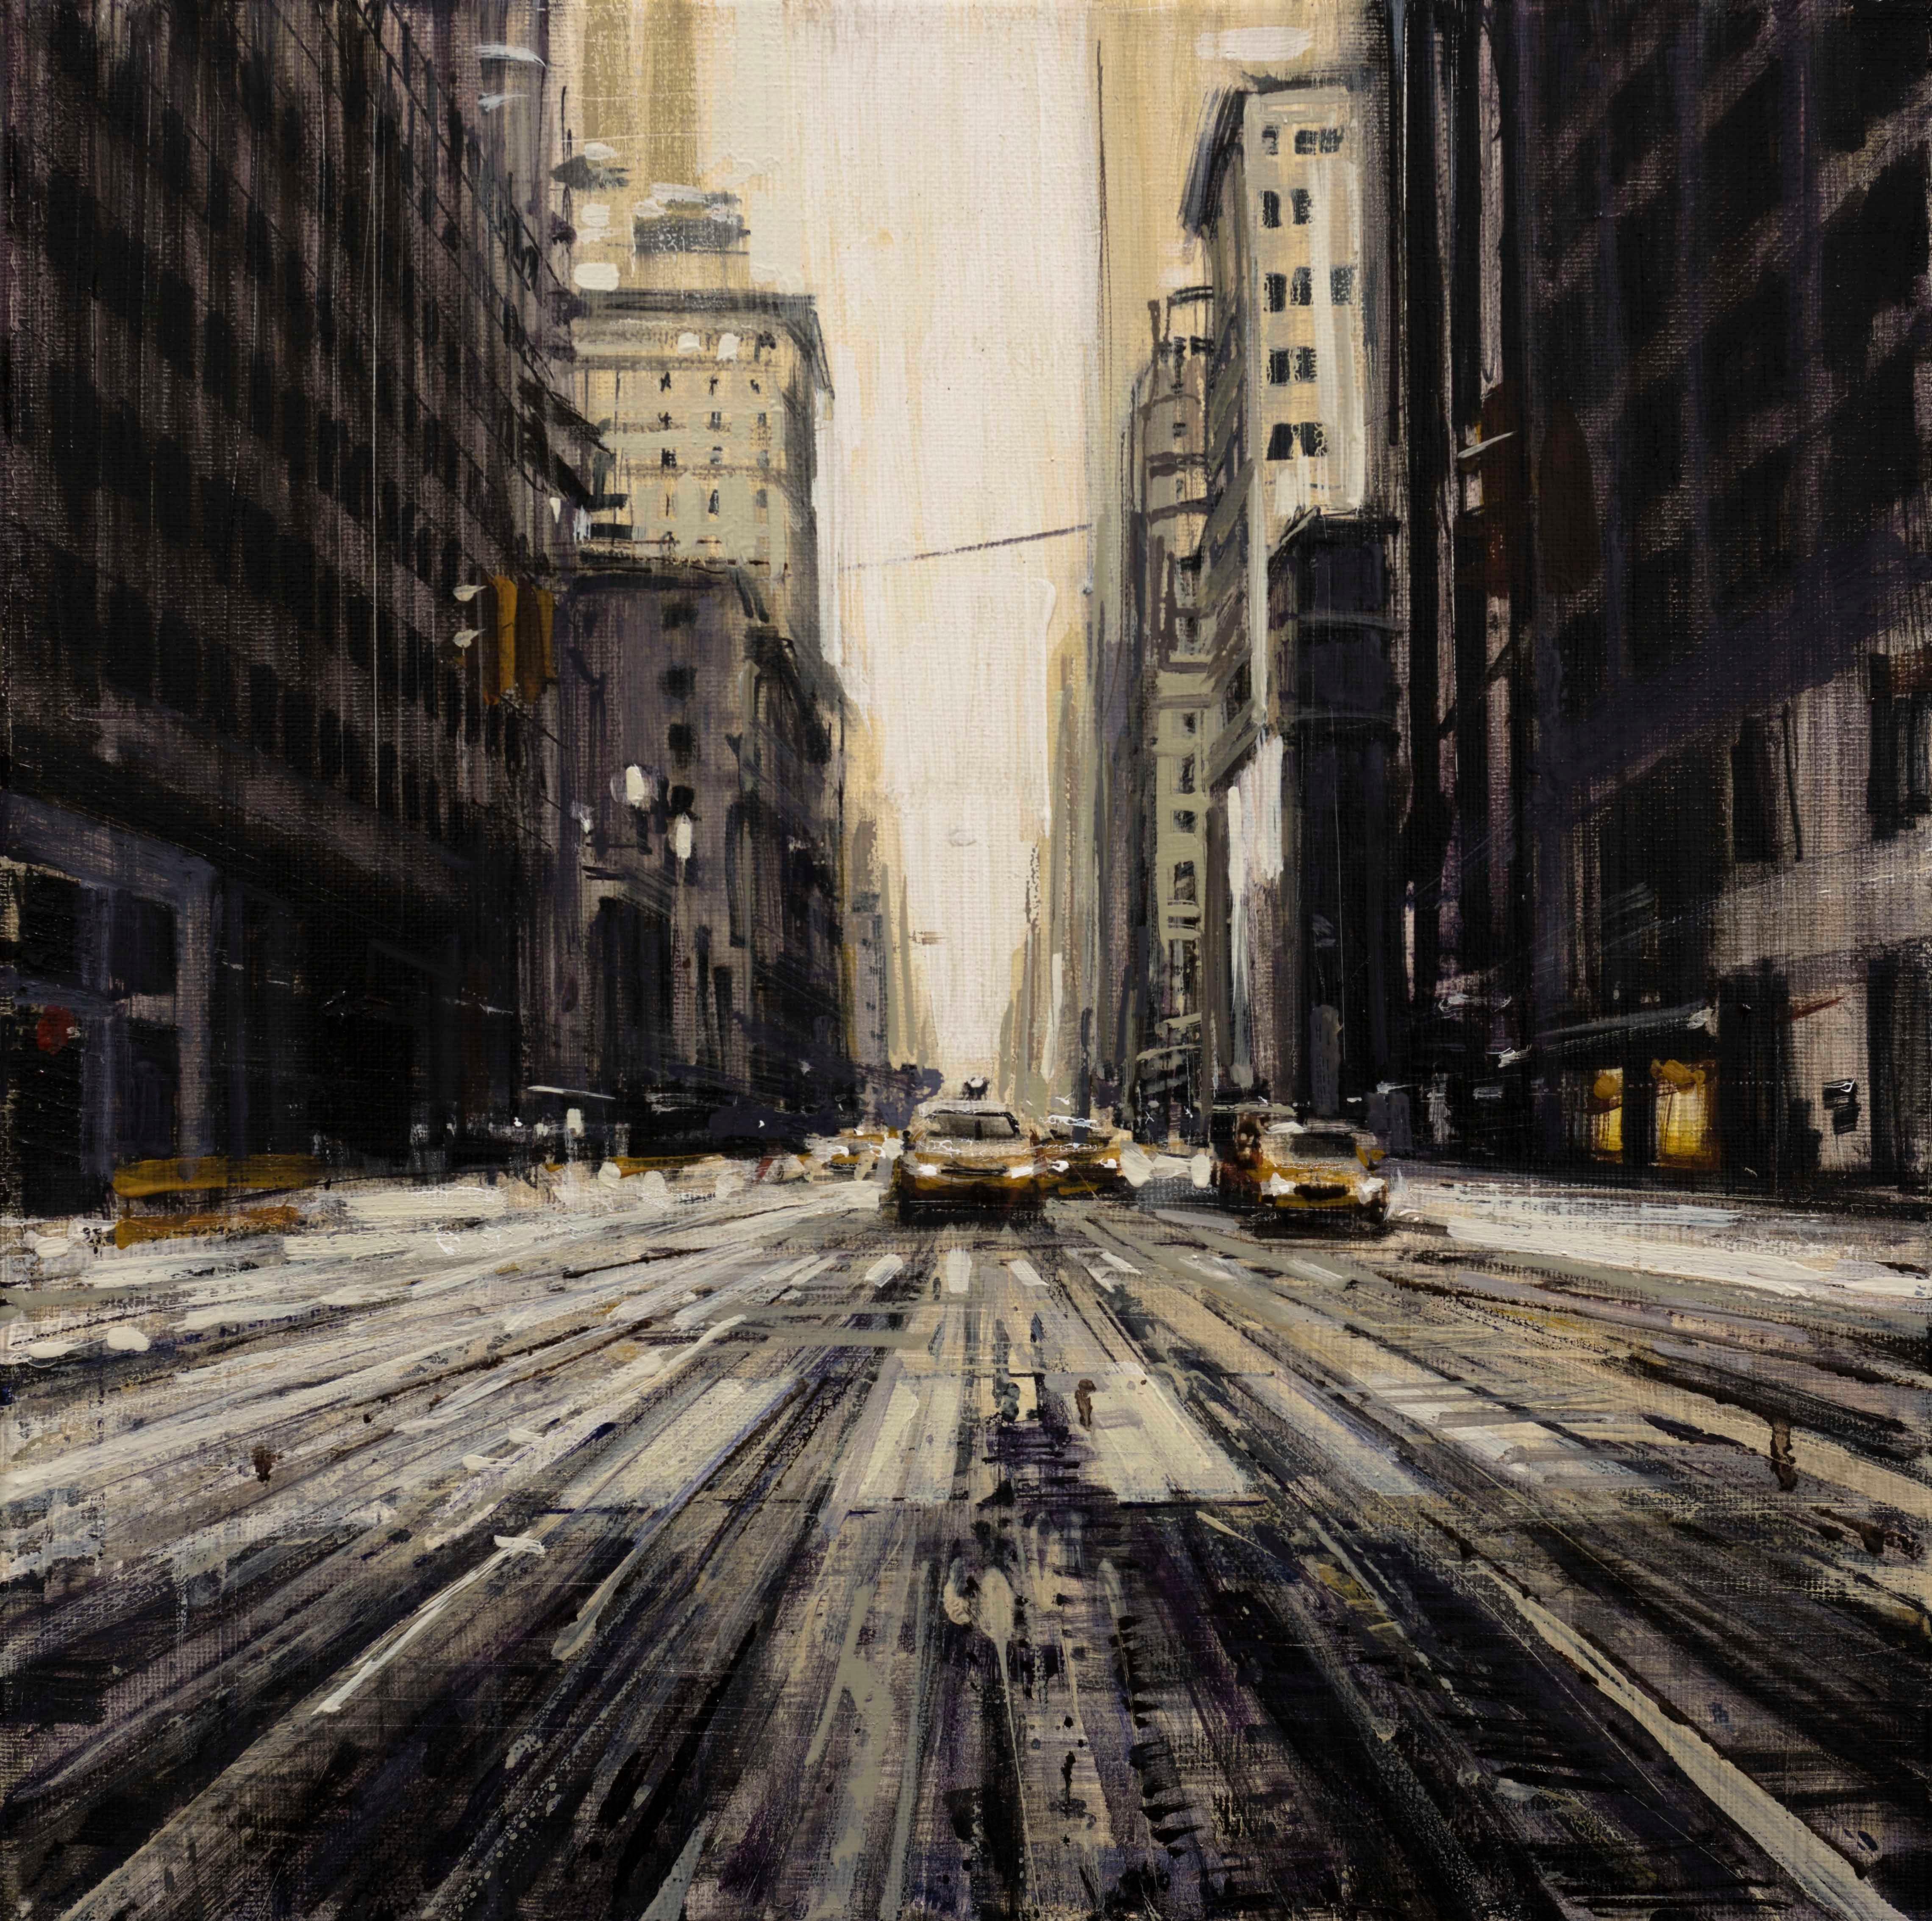 Snowy Street in NYC